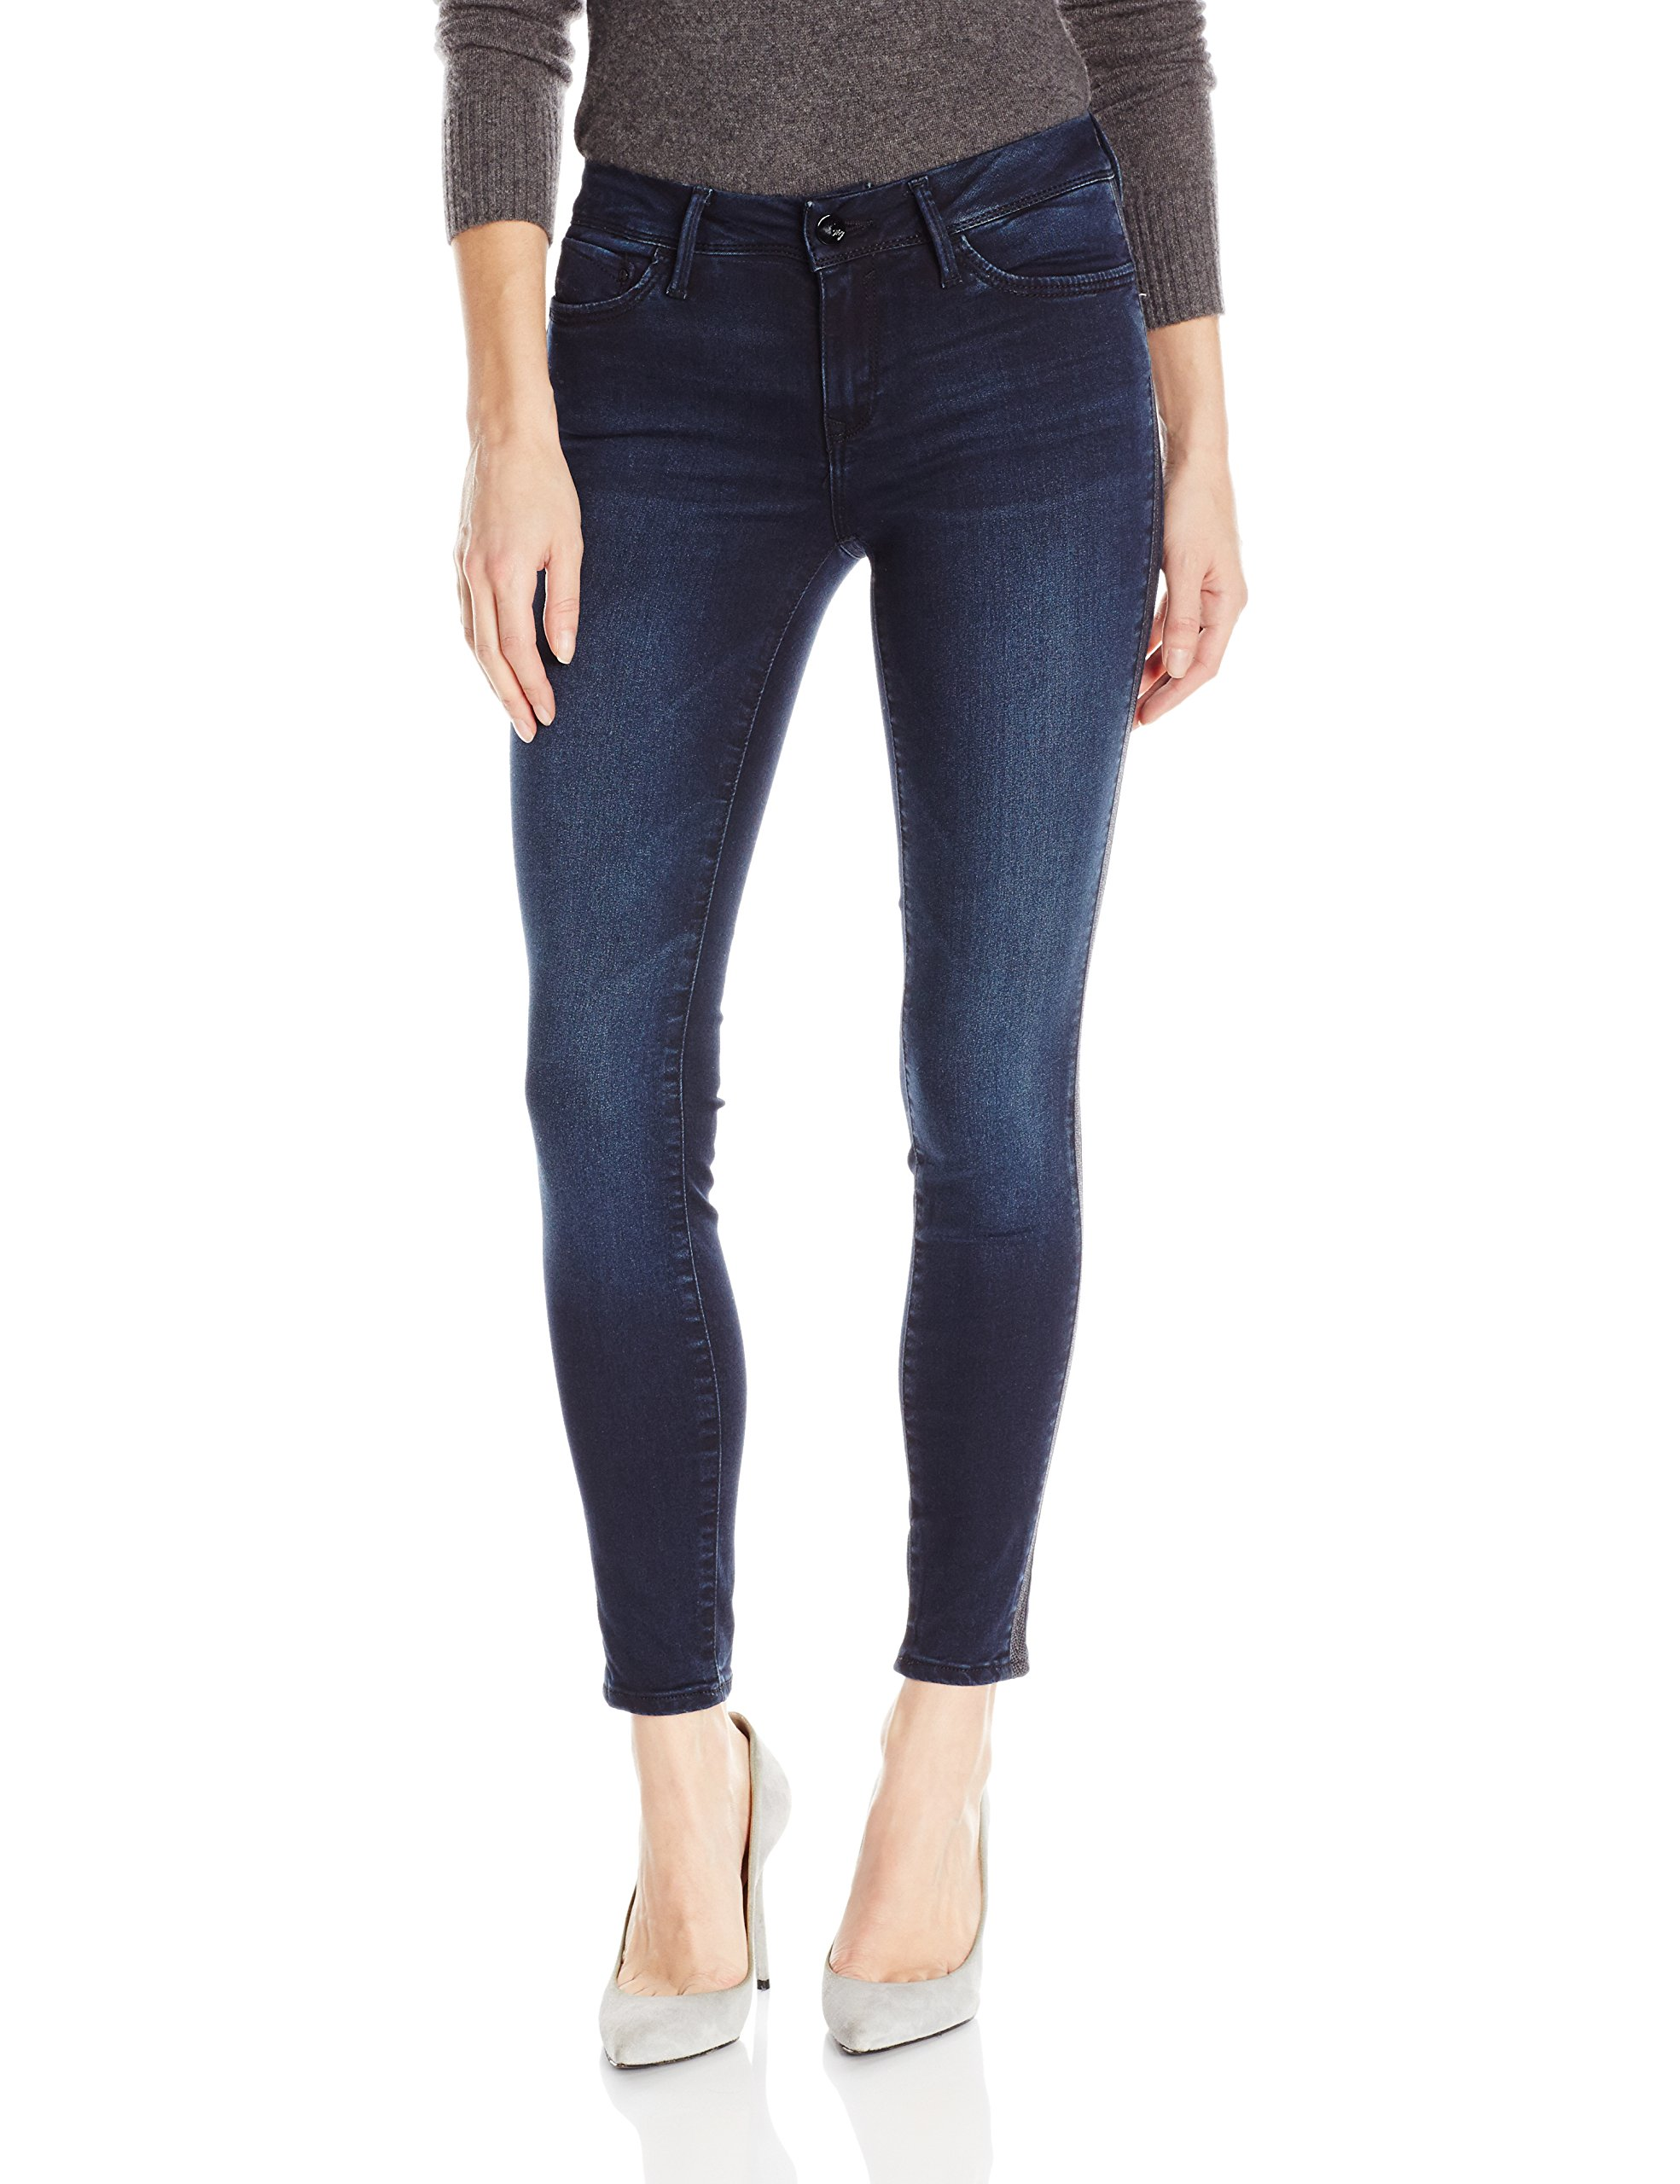 Mavi Jeans Women's Adriana Ankle Mid Rise Super Skinny, Overnight Gold, 24